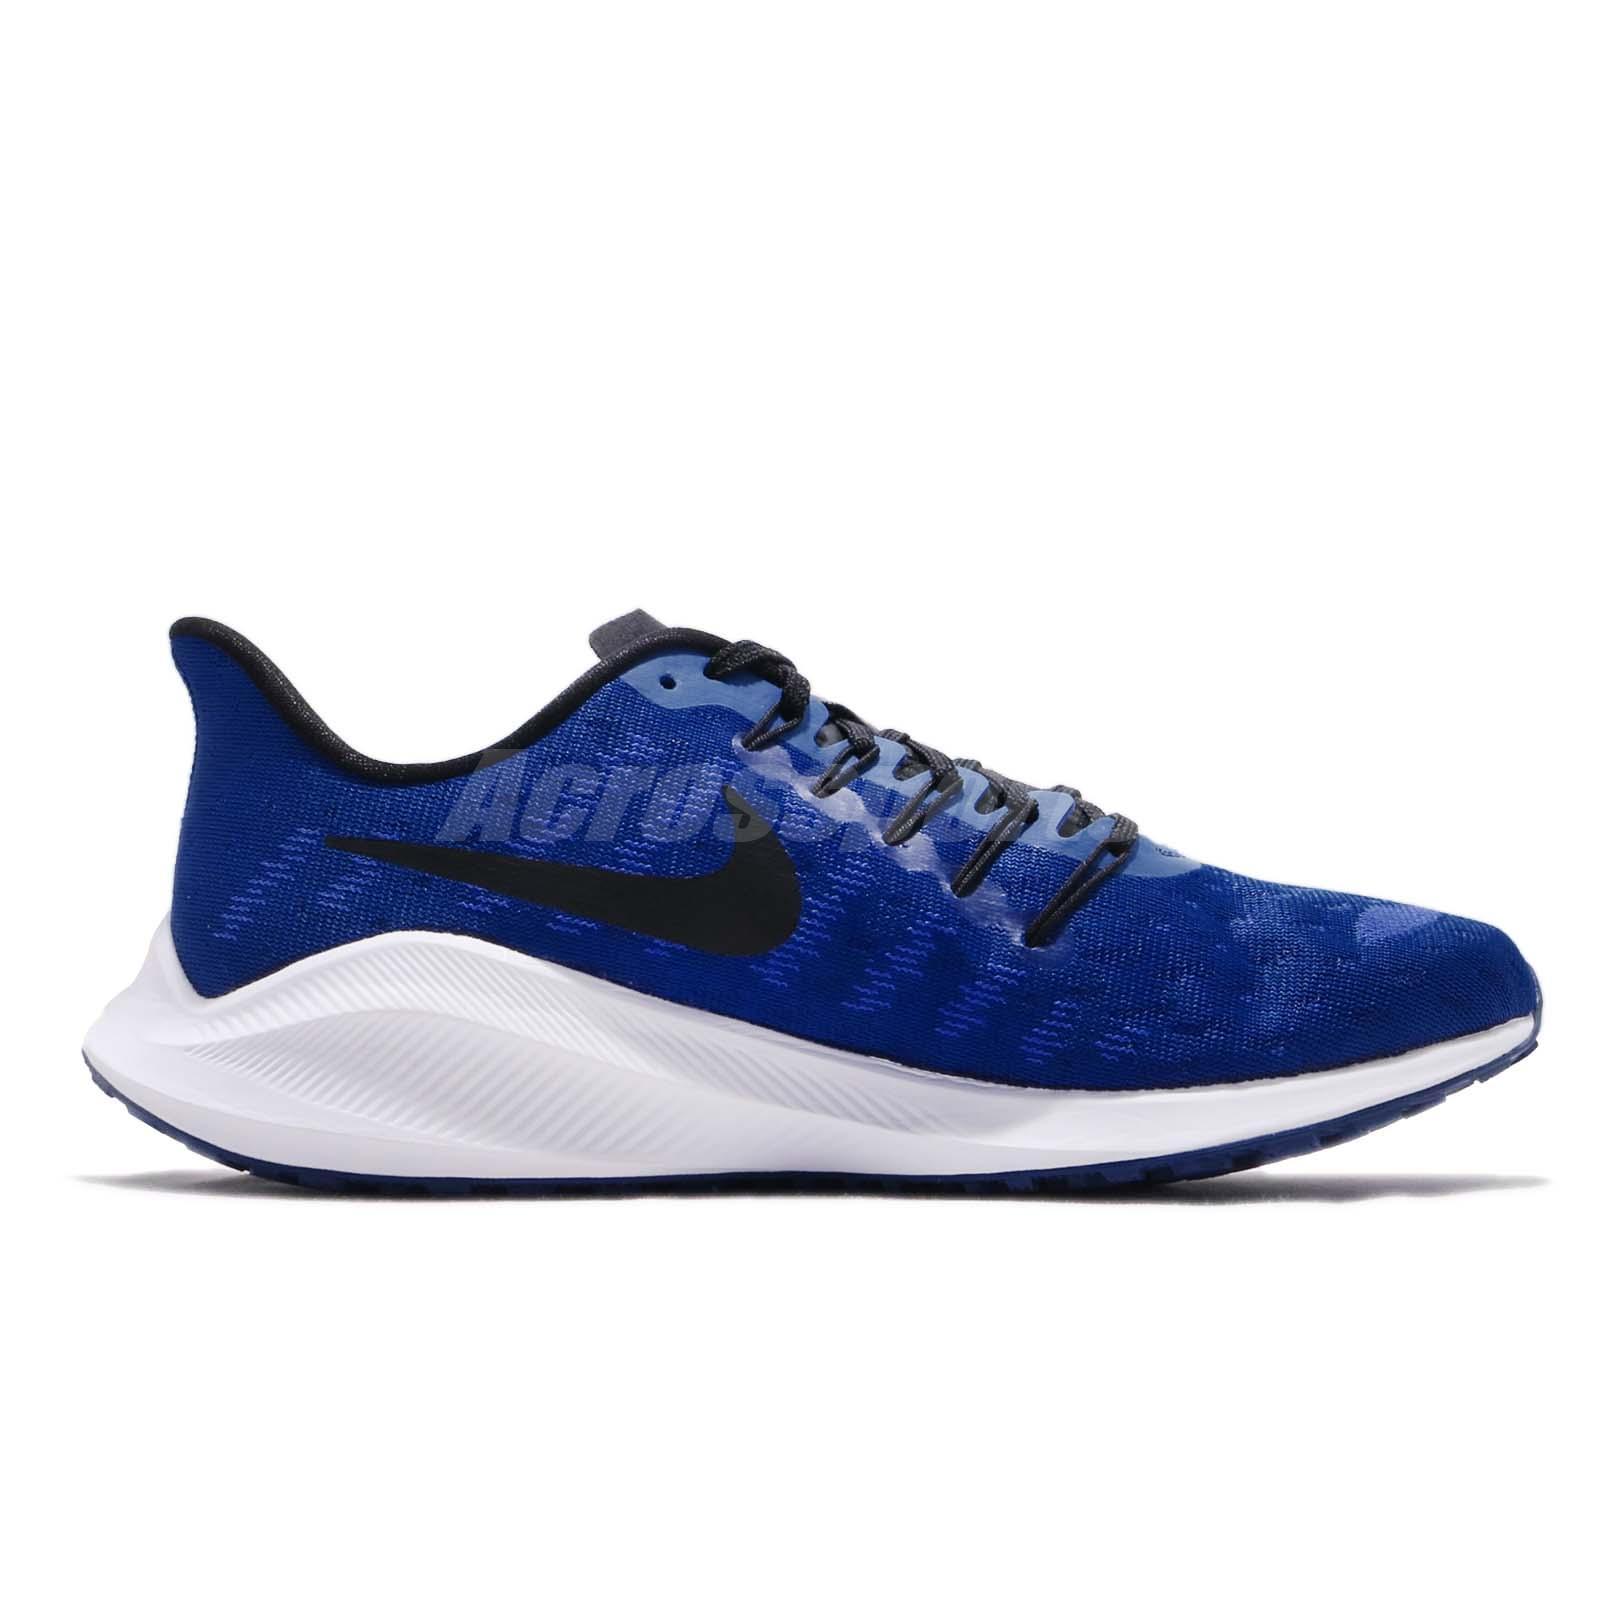 e852125dadf Nike Air Zoom Vomero 14 Indigo Force Photo Blue Men Running Shoes ...